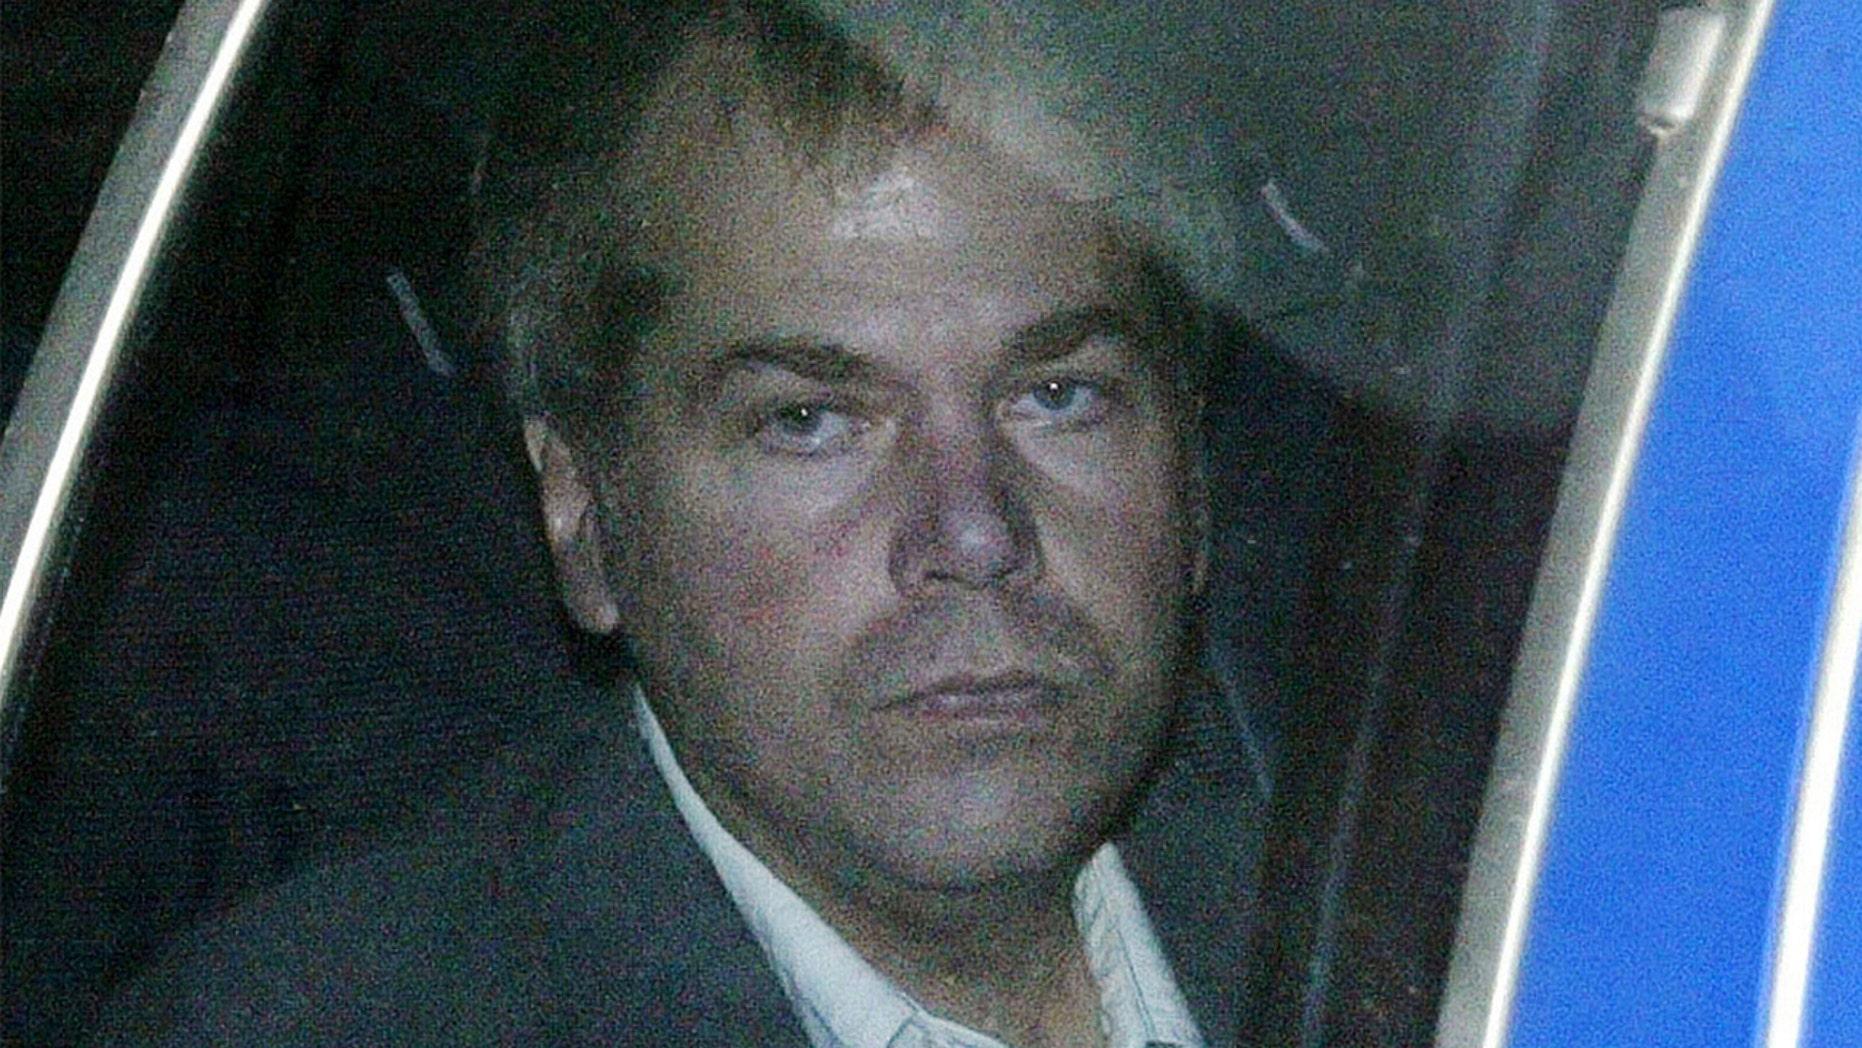 In this Nov. 18, 2003, file photo, John Hinckley Jr. arrives at U.S. District Court in Washington.